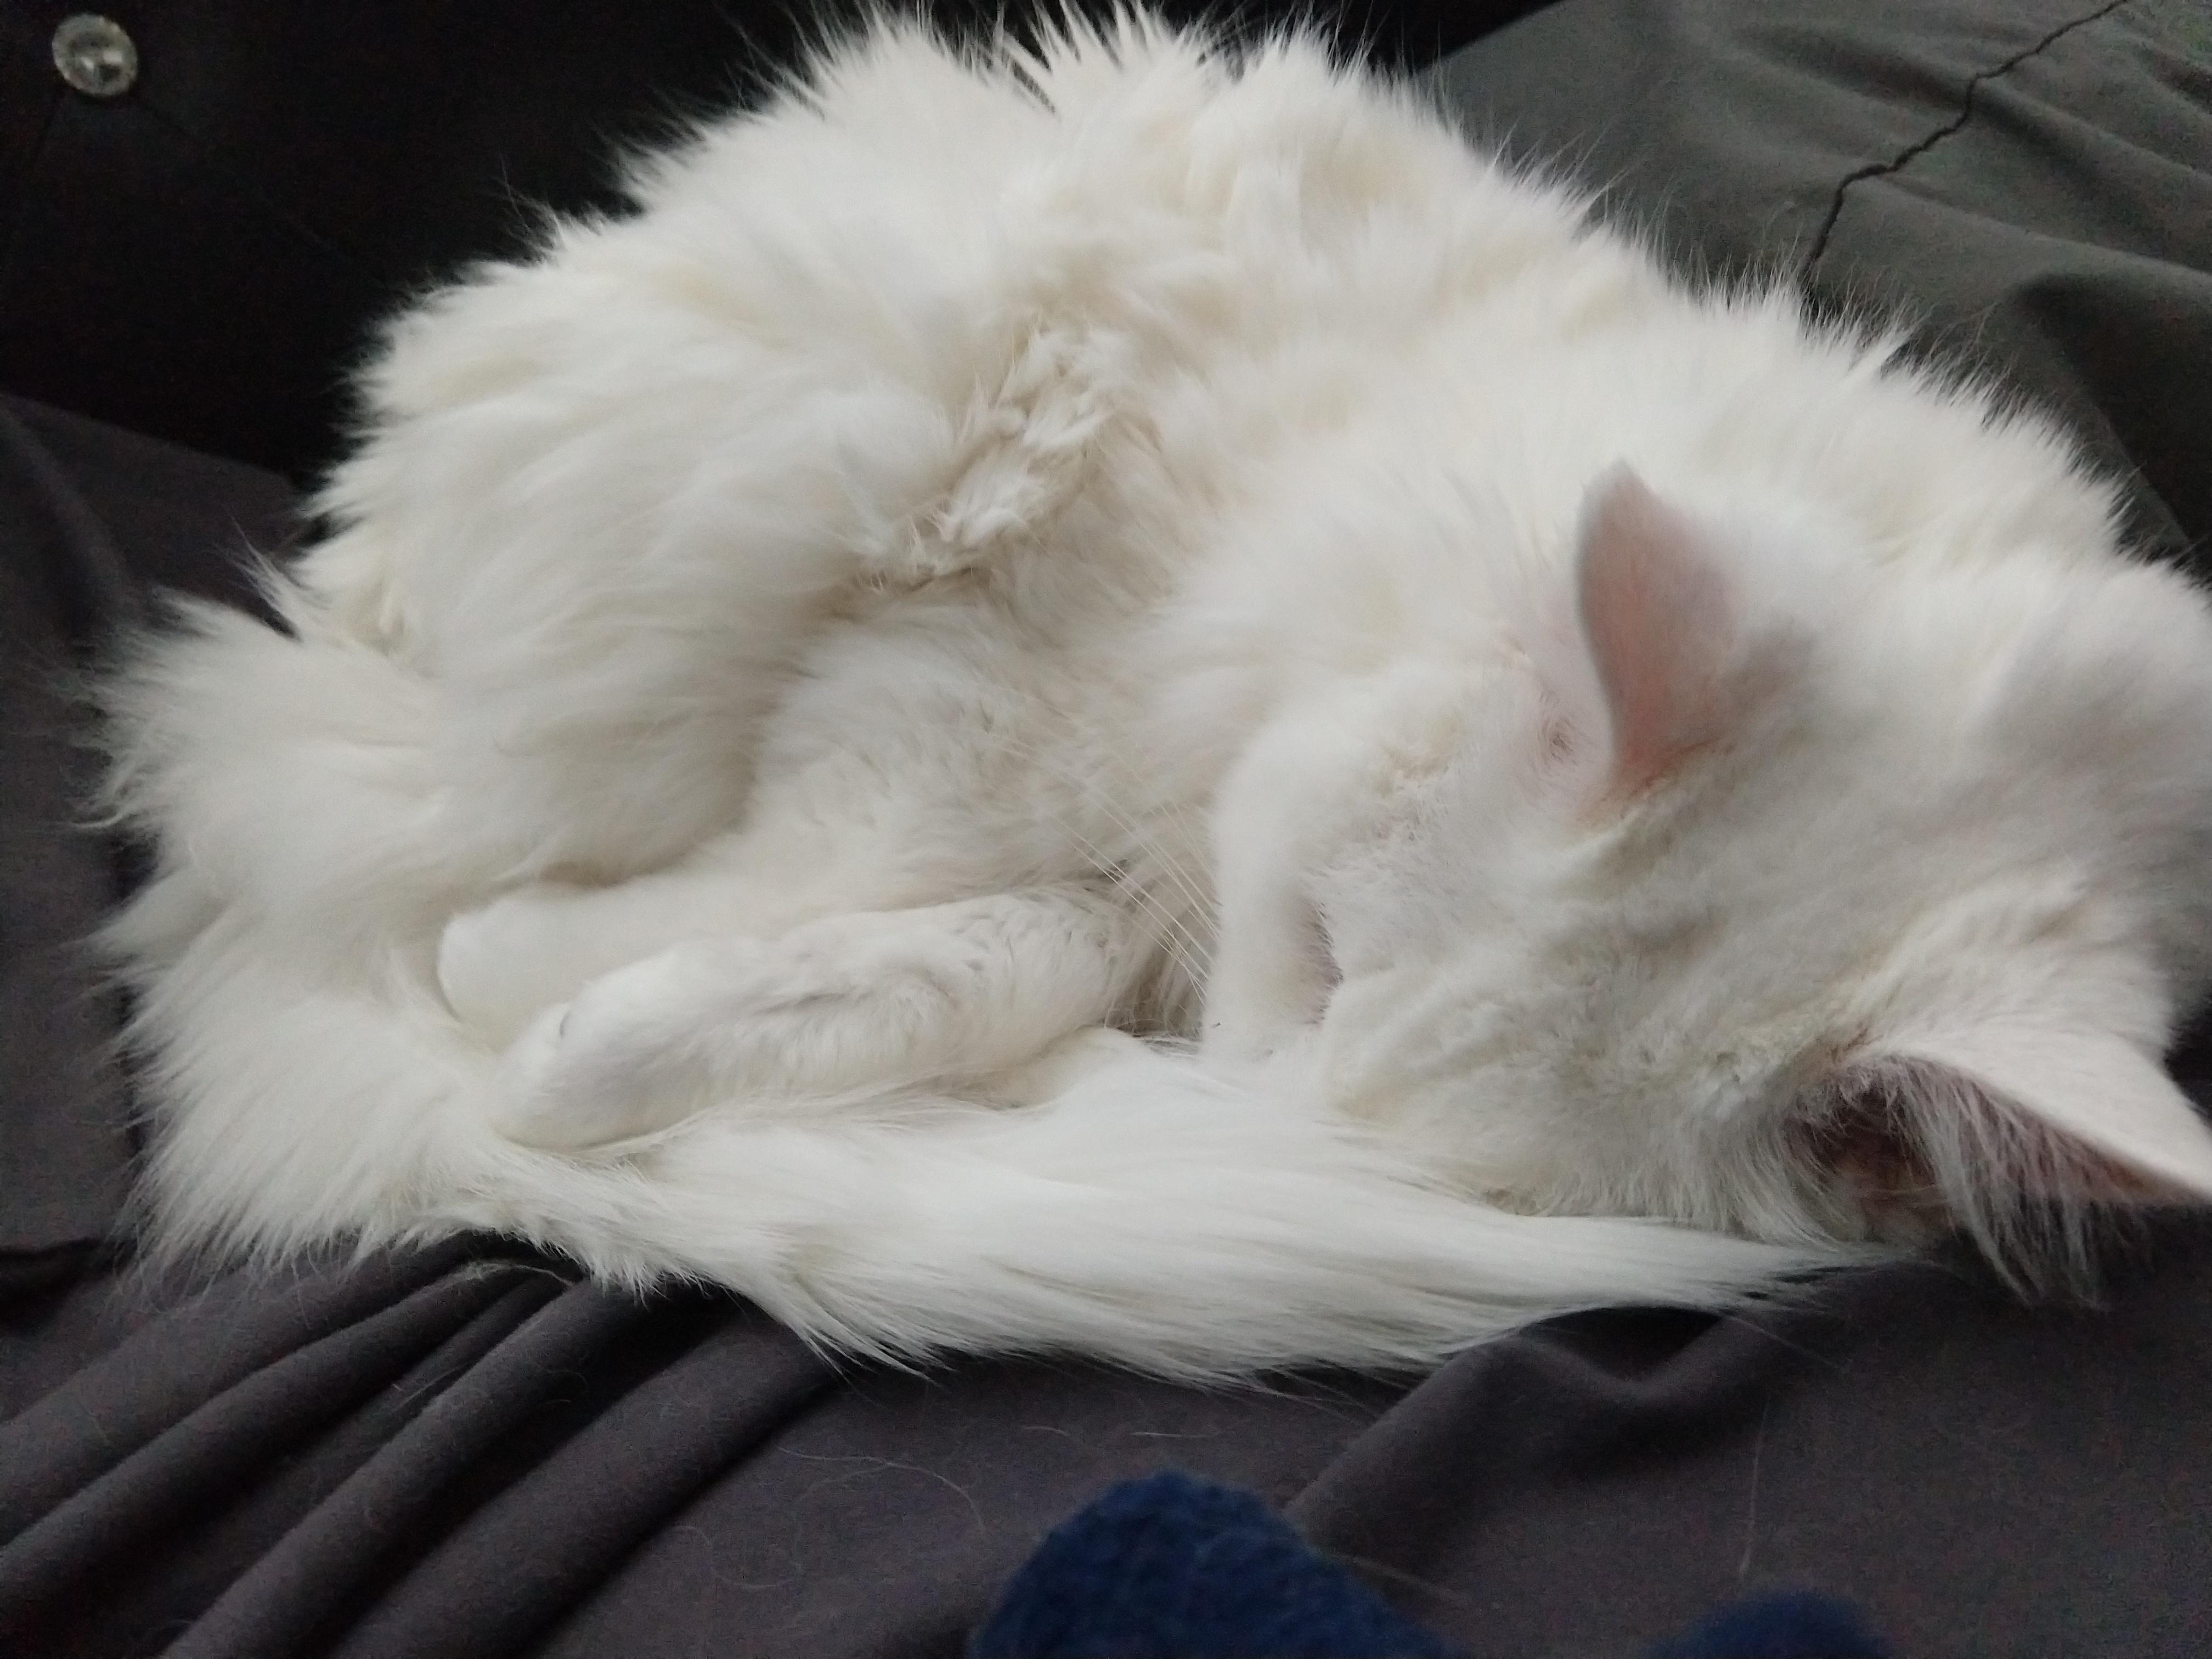 Best Part Of Owning A Senior Kitty Sleepy Snow Days Http Bit Ly 2cntg8n Kitty Sleepy Best